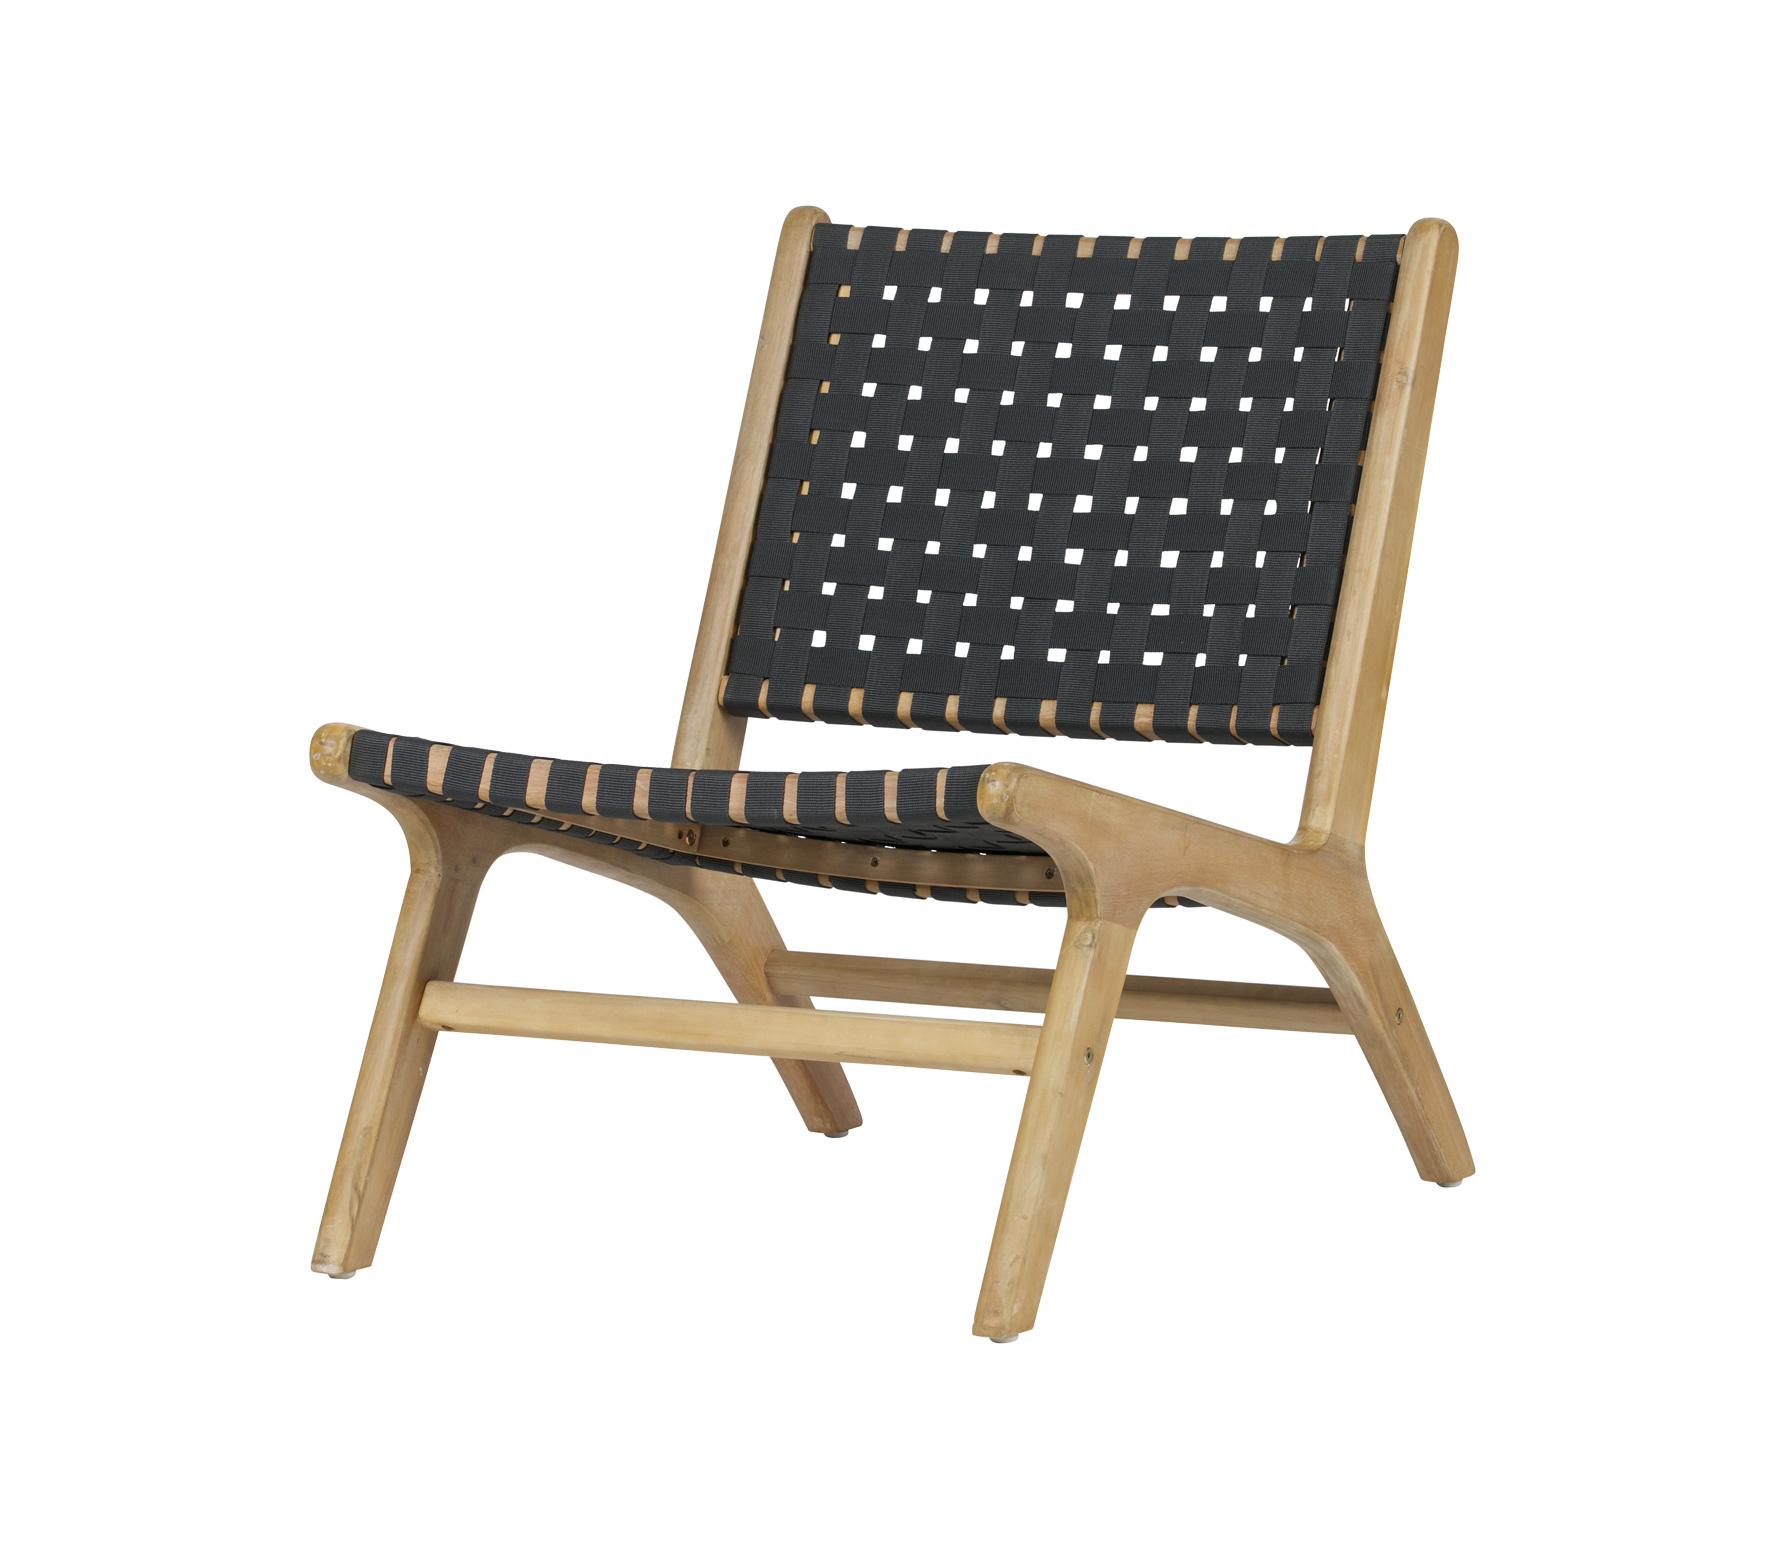 vtwonen Frame geweven stoel antraciet hout